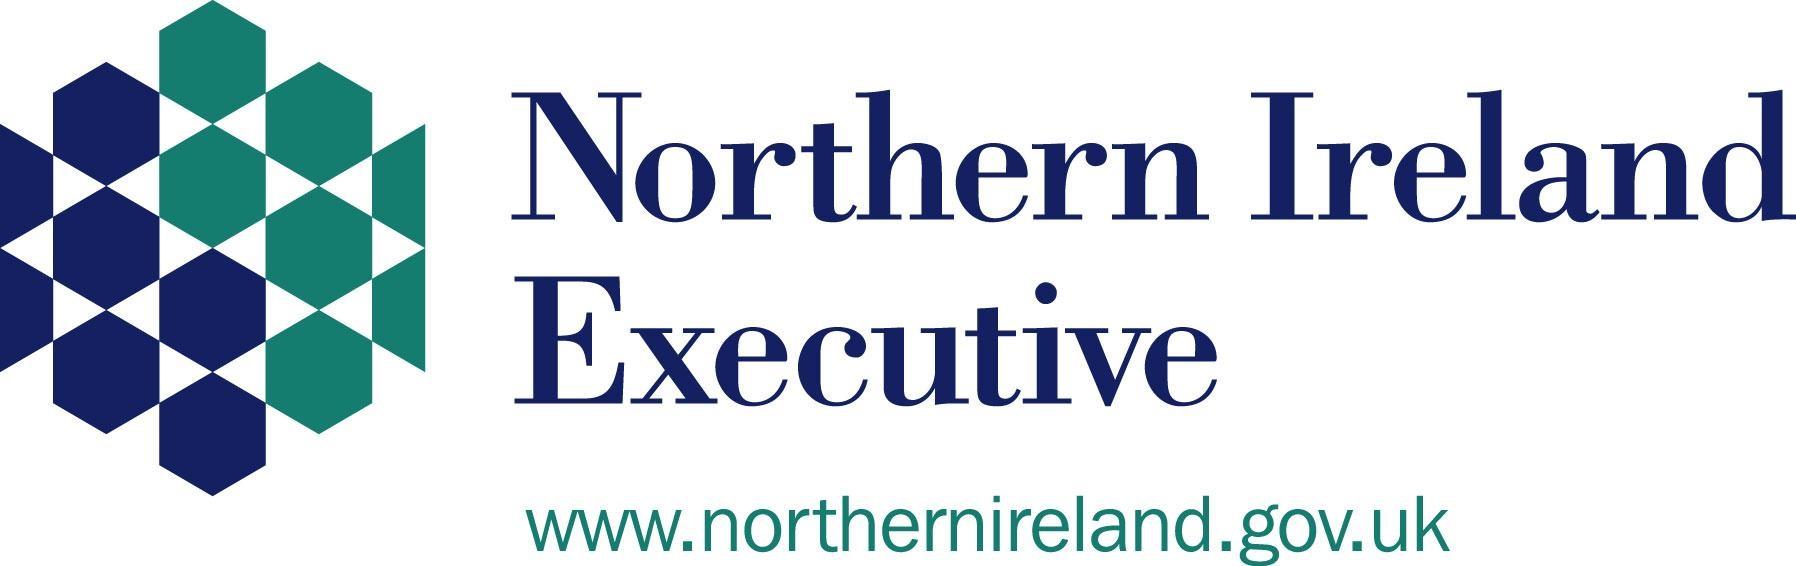 The Northern Ireland Executive Logo